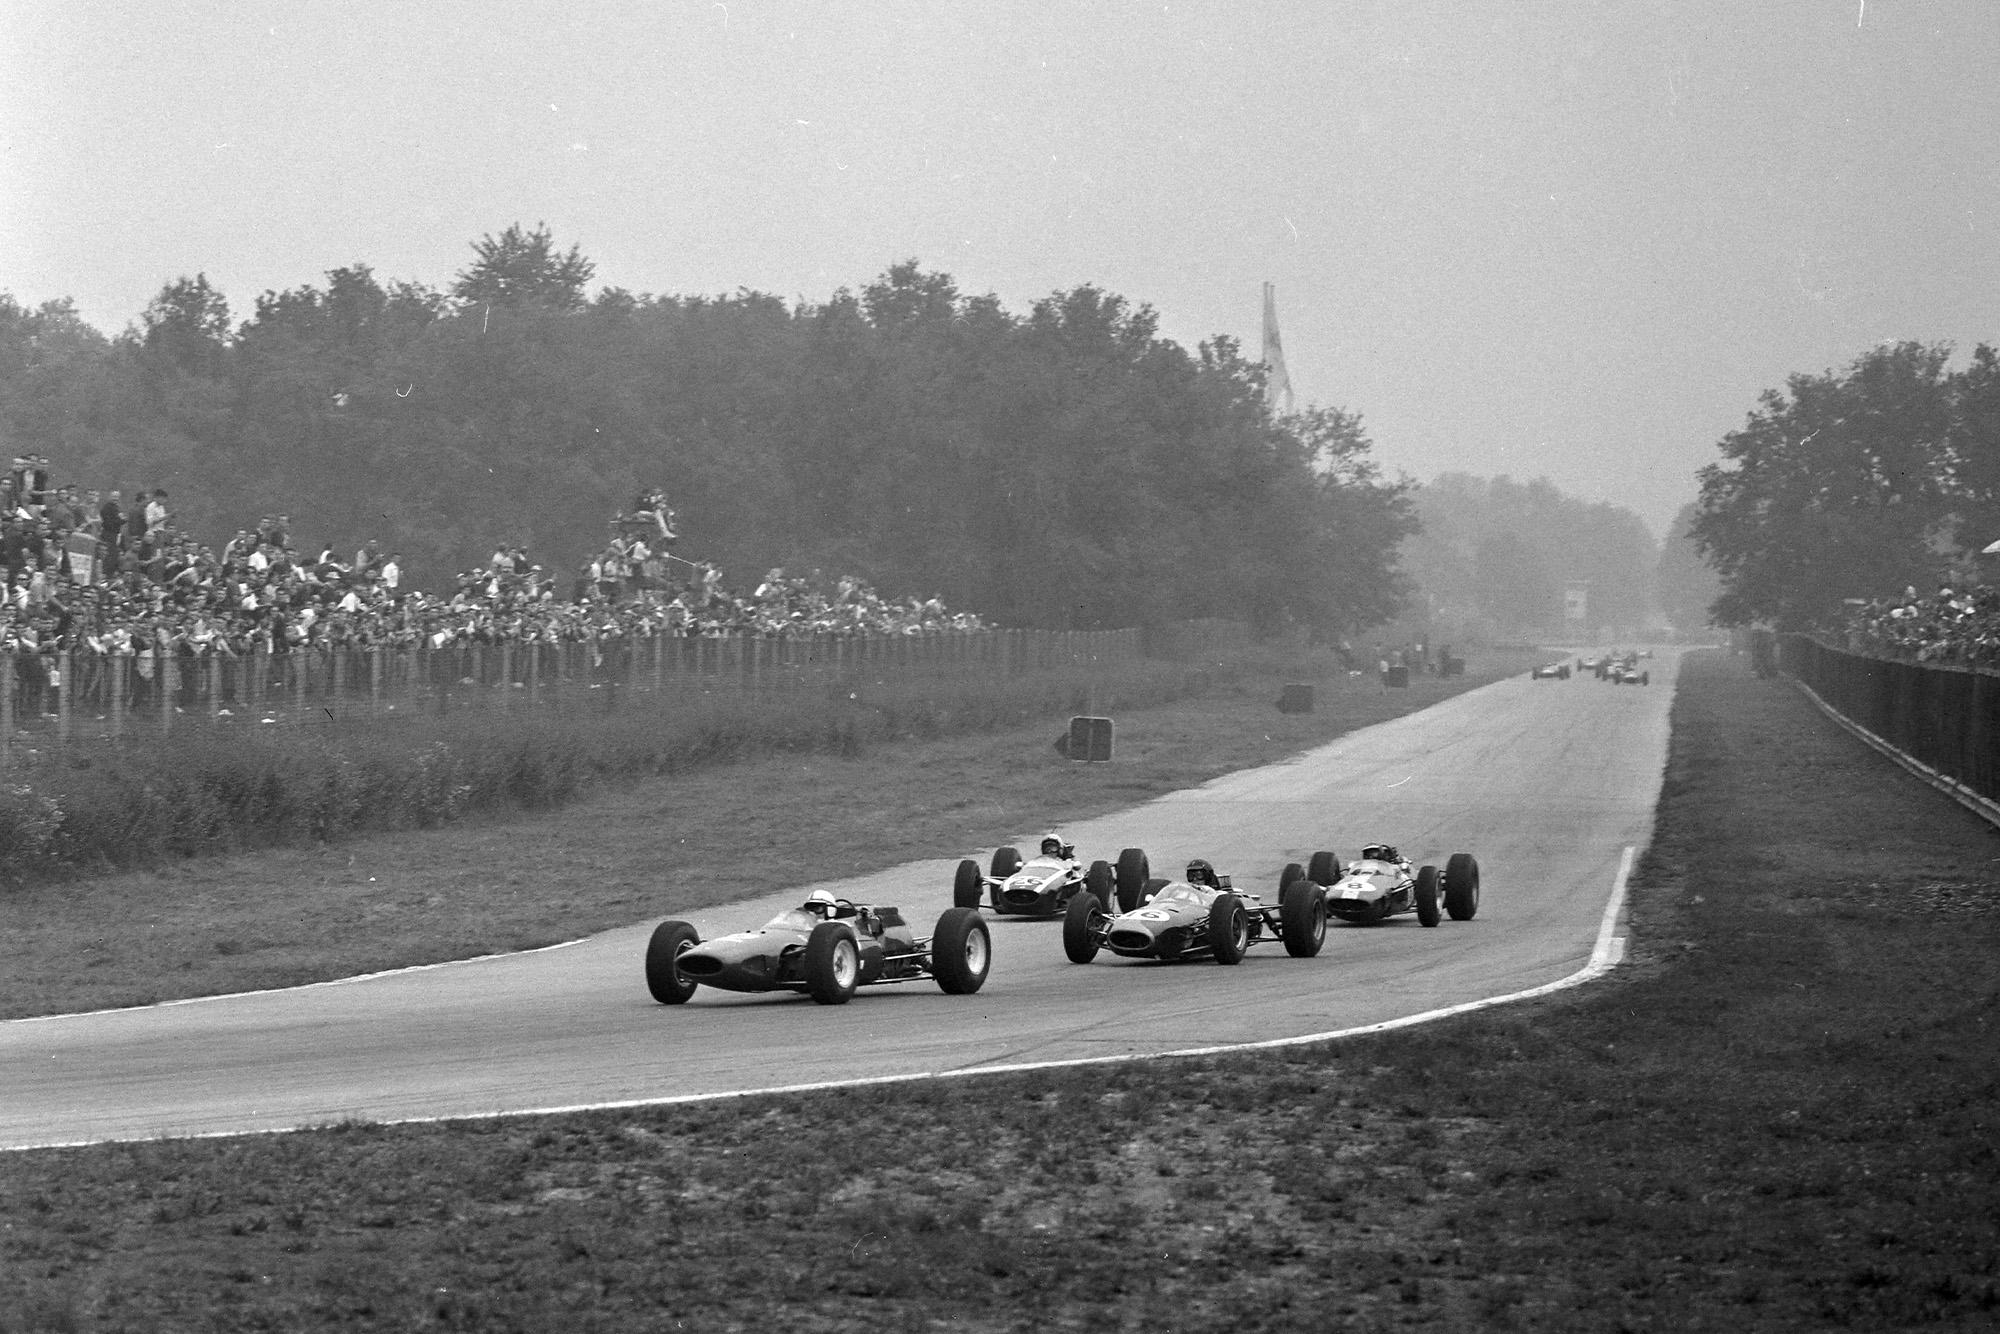 John Surtees, Ferrari 158, leads Dan Gurney, Brabham BT7 Climax, Bruce McLaren, Cooper T73 Climax, and Jim Clark, Lotus 33-Climax